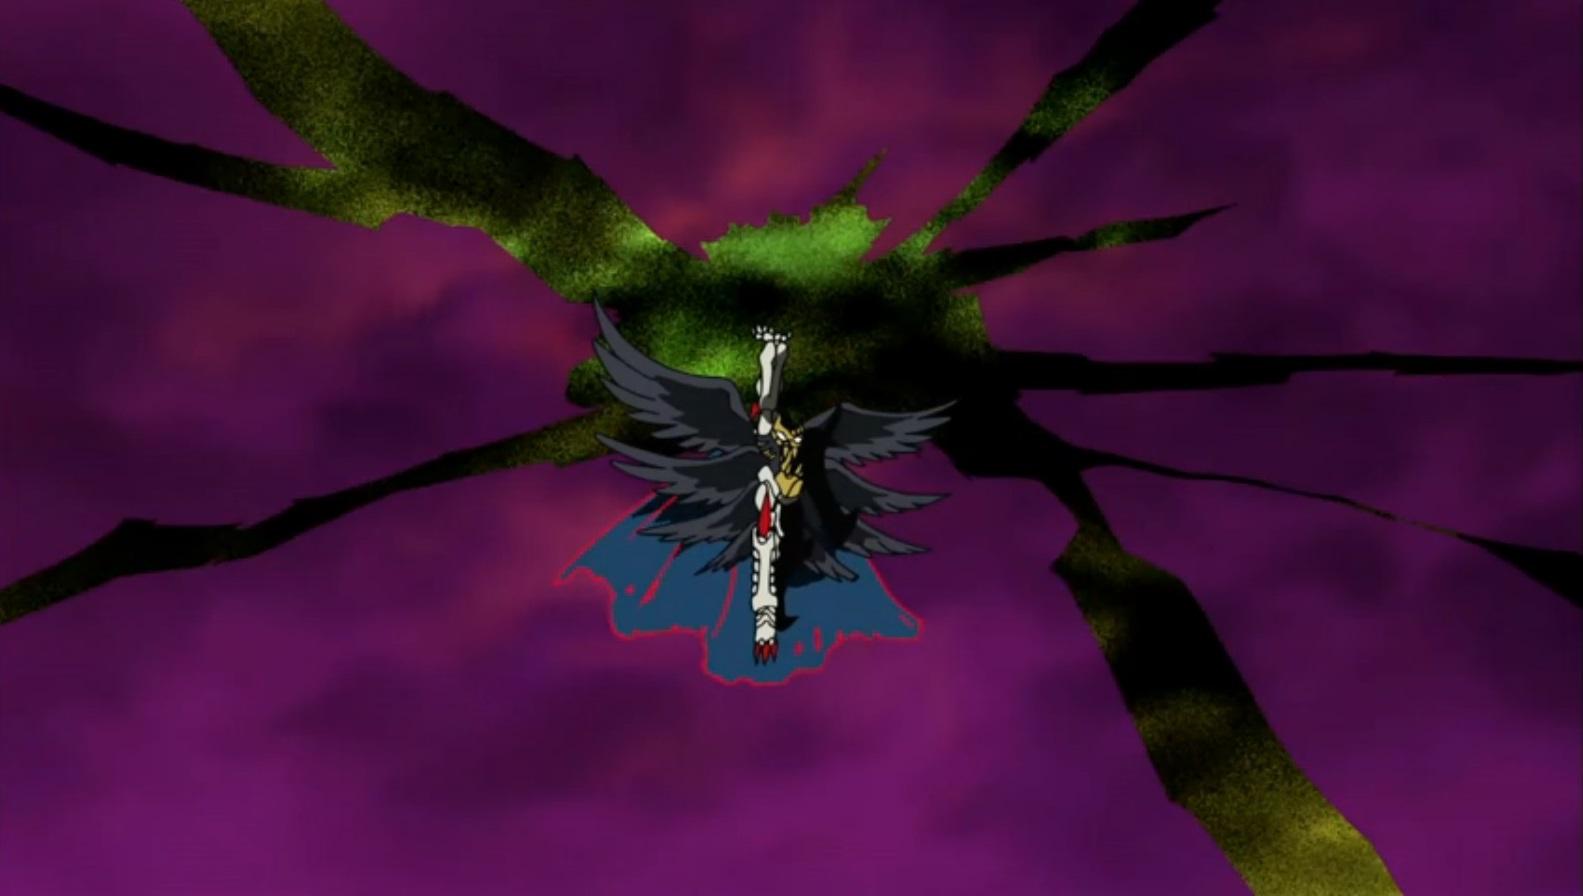 Digimon World 3 - Episode 1 - BEST DIGIMON GAME EVER ...